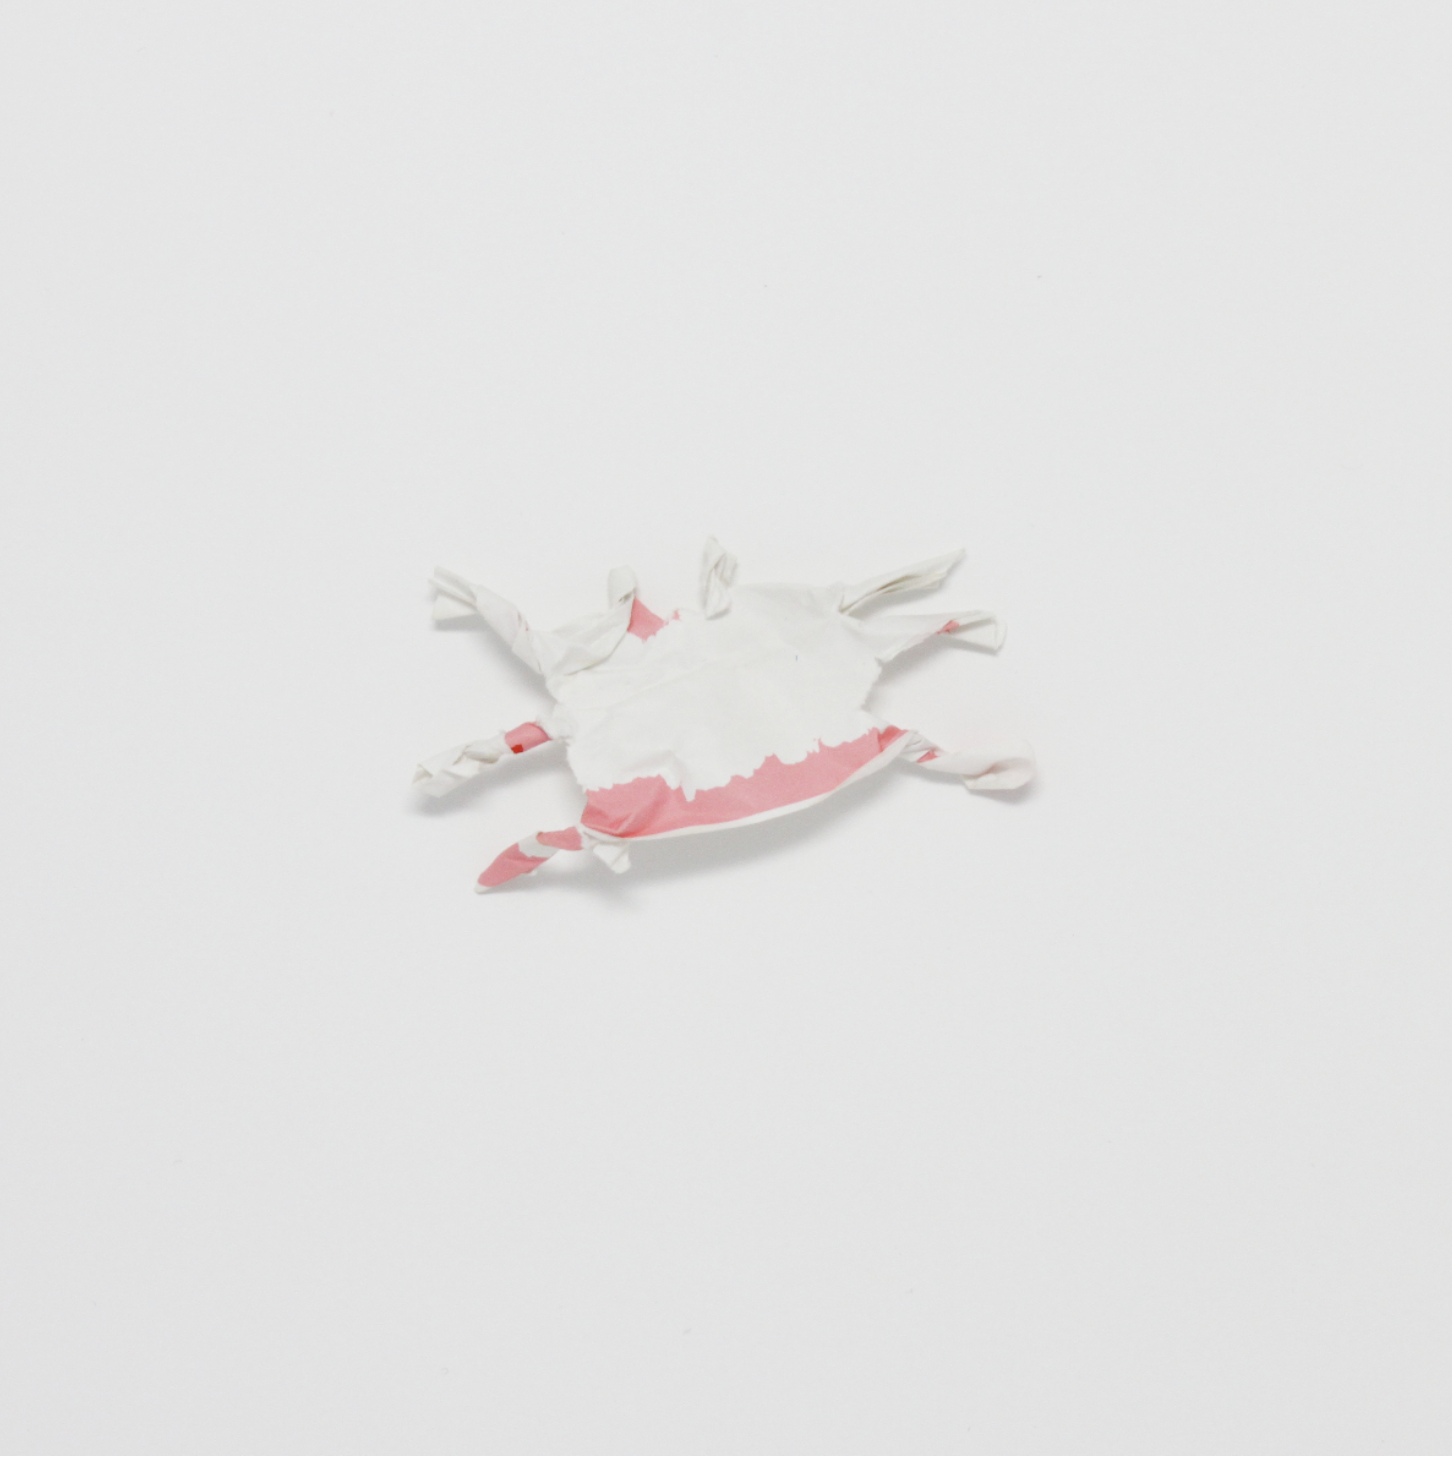 Crab paper origami YAMAGATA : Izakaya.png